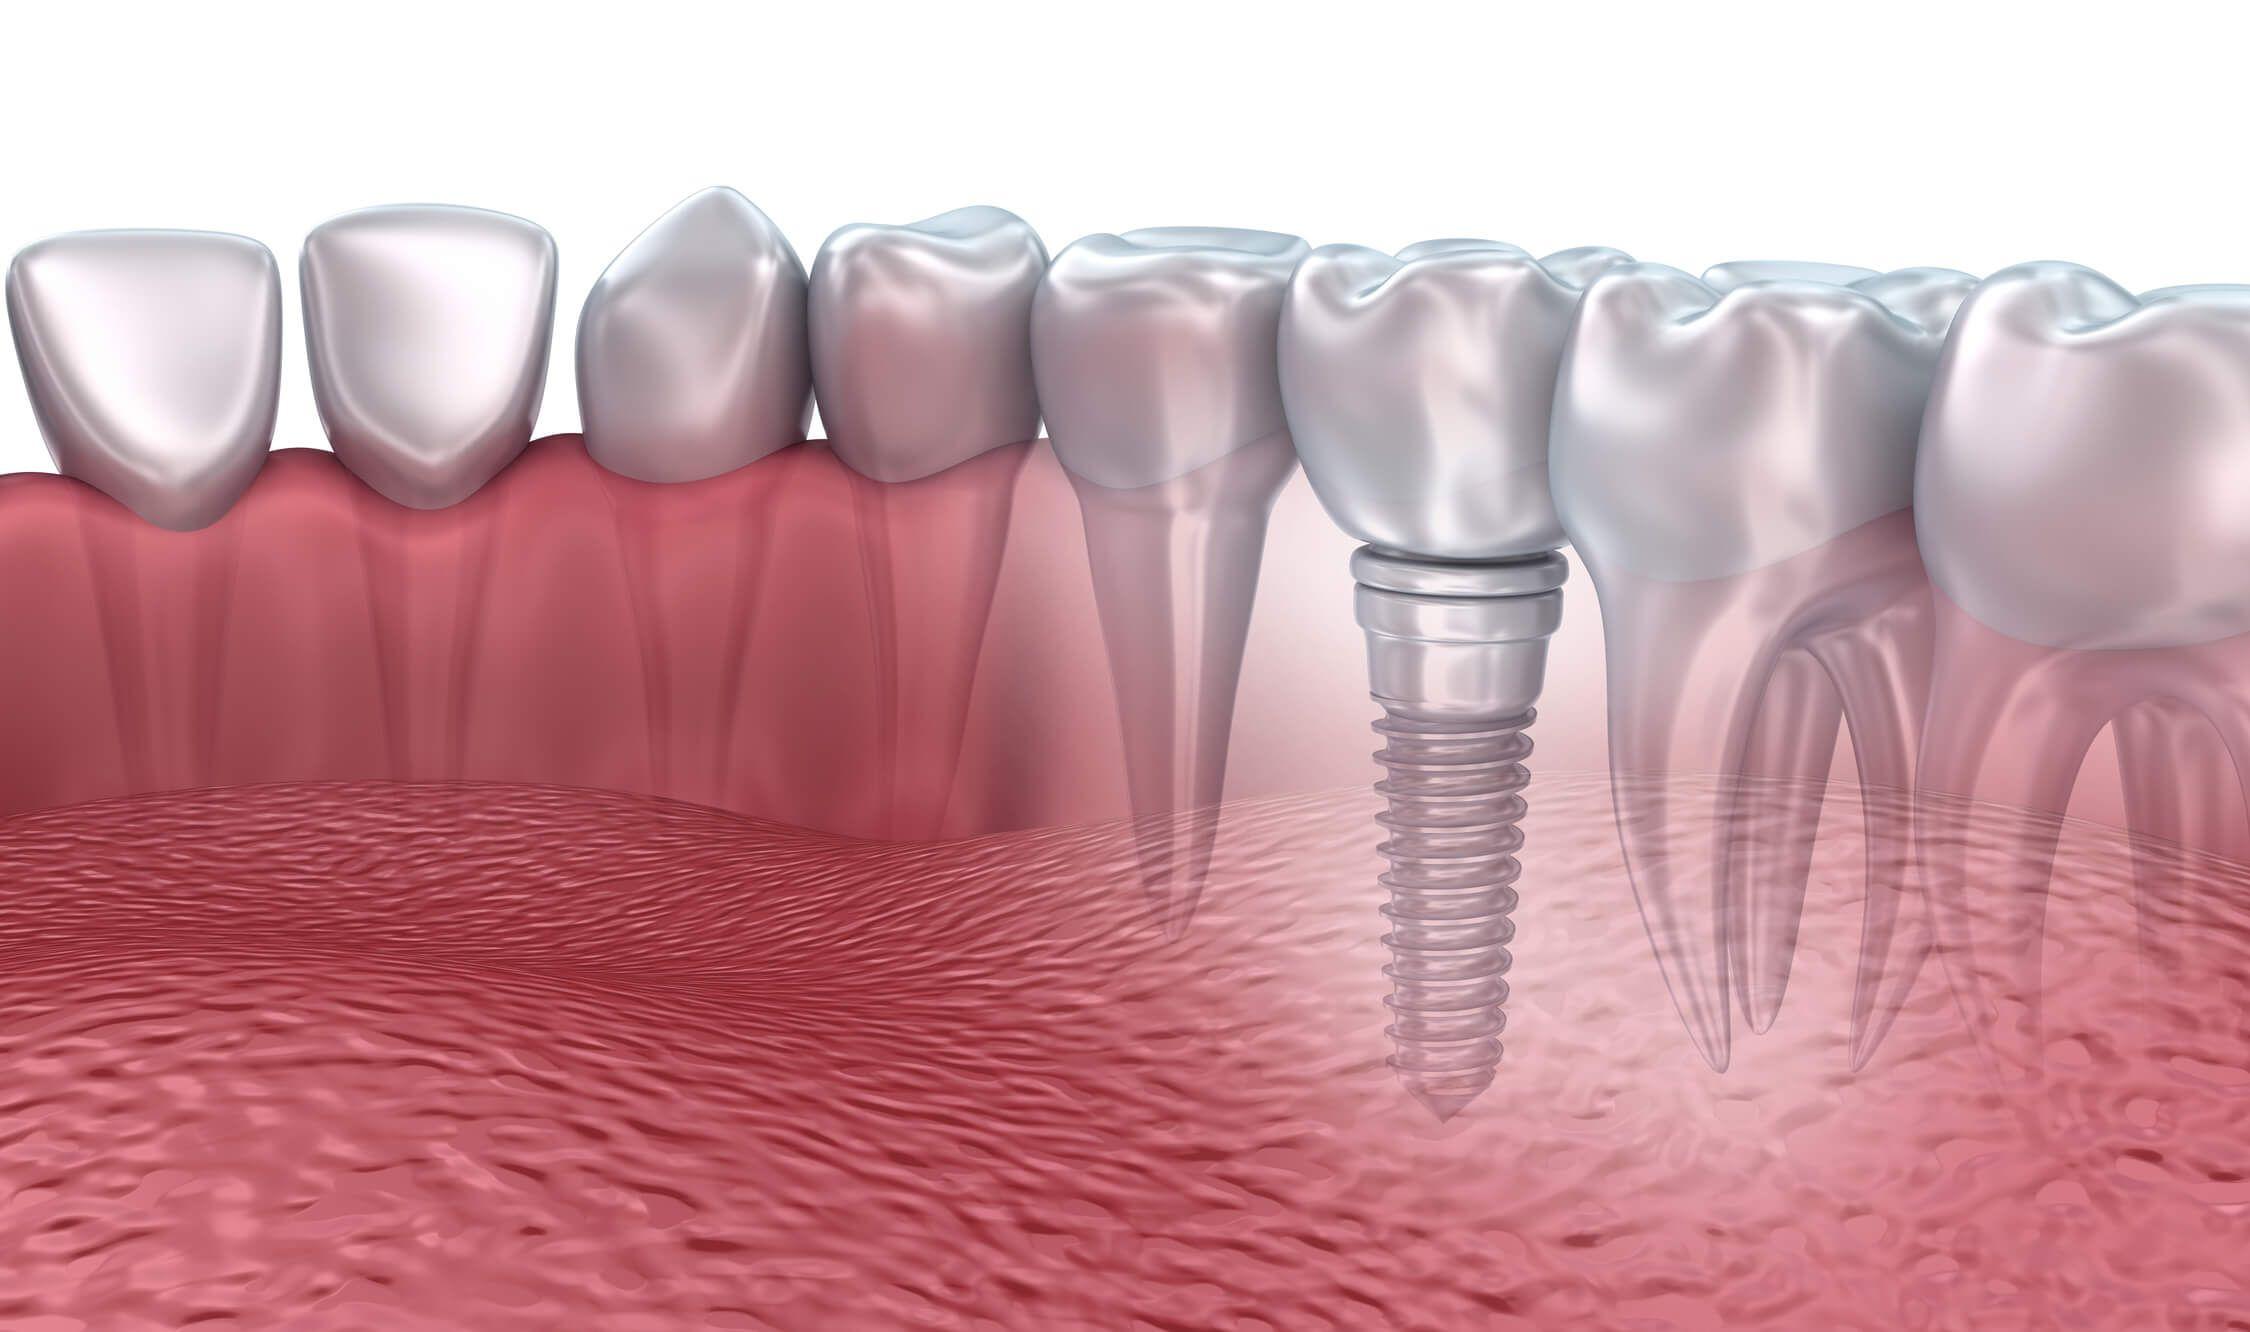 Dental implants in macon ga dental implants dental